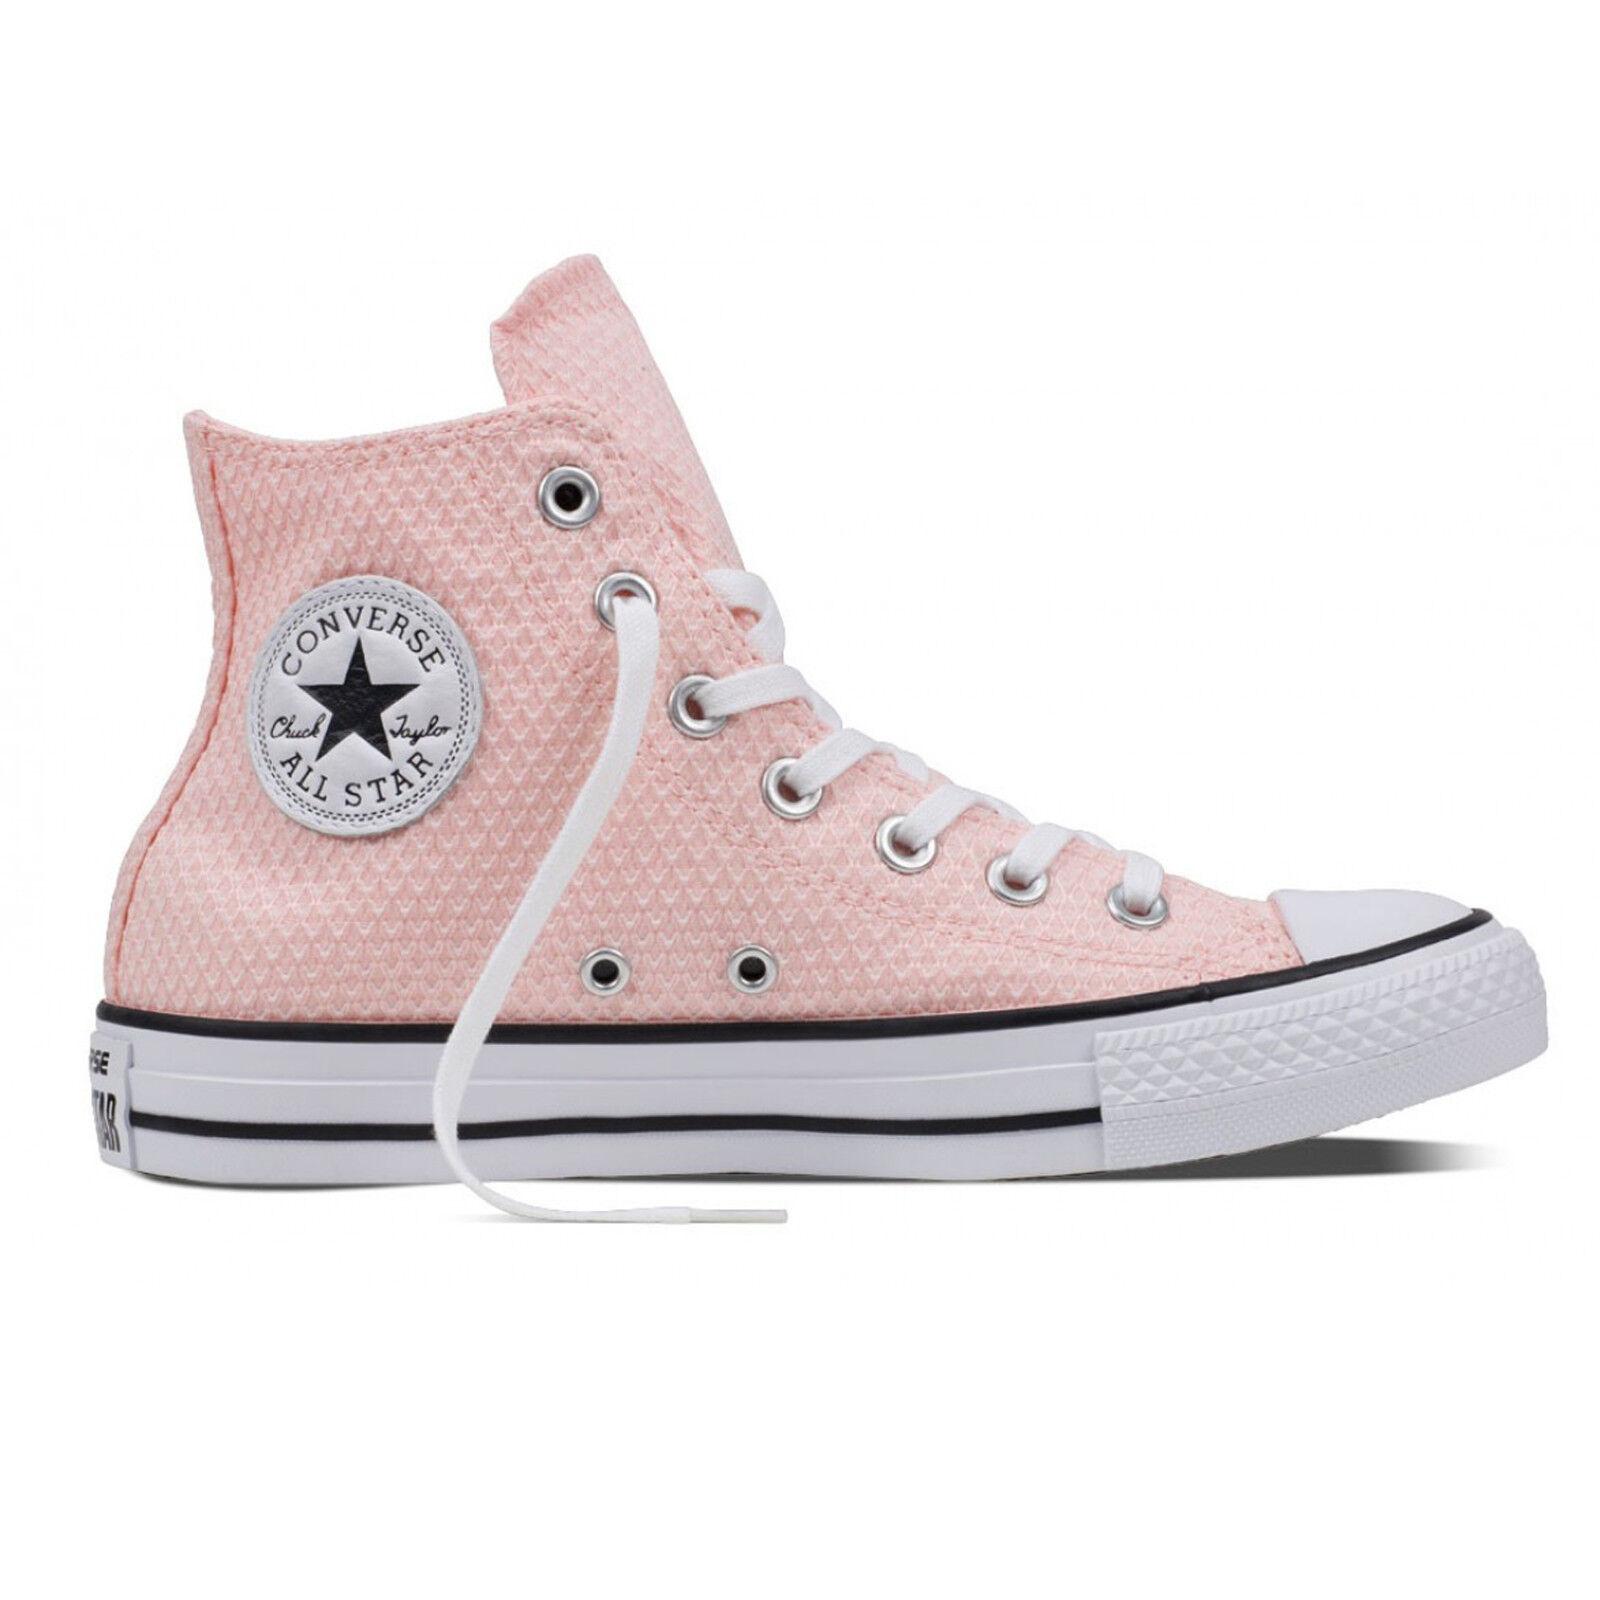 Converse-Alm HI bianca VAPOR rosa bianca scarpe da ginnastica Chuck Taylor All Star Chucks